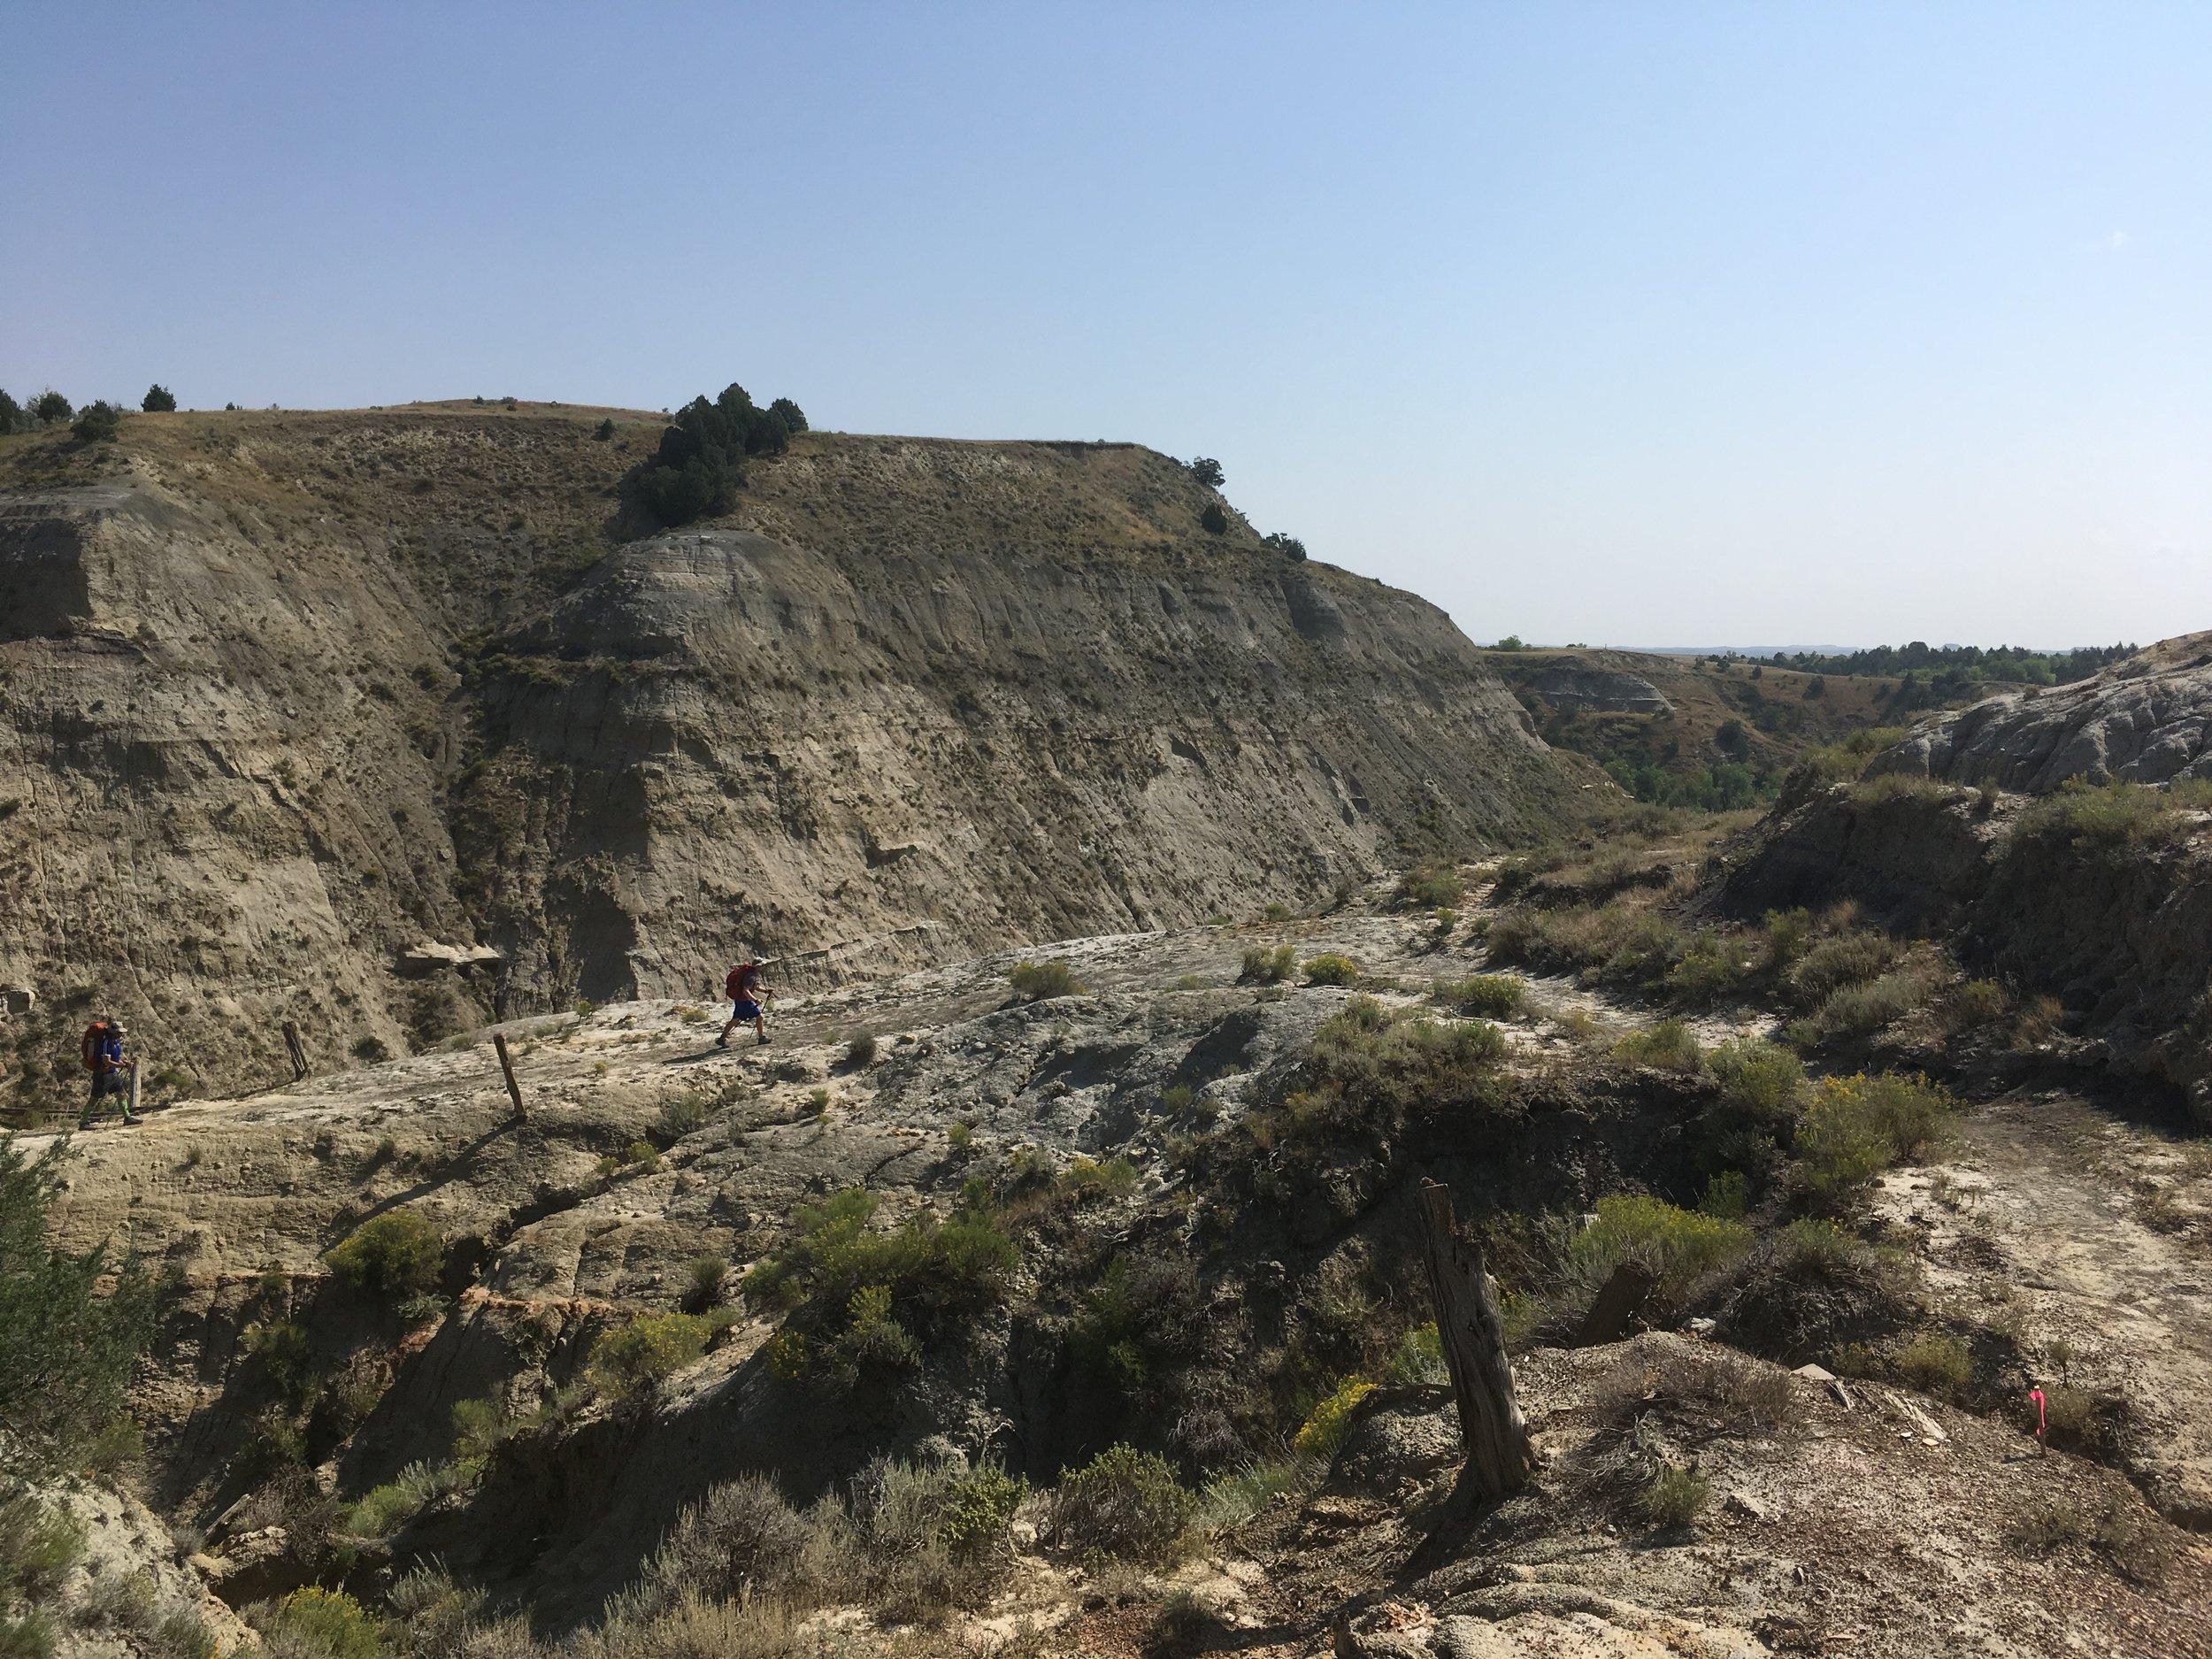 Rounding a Ridge Crossing